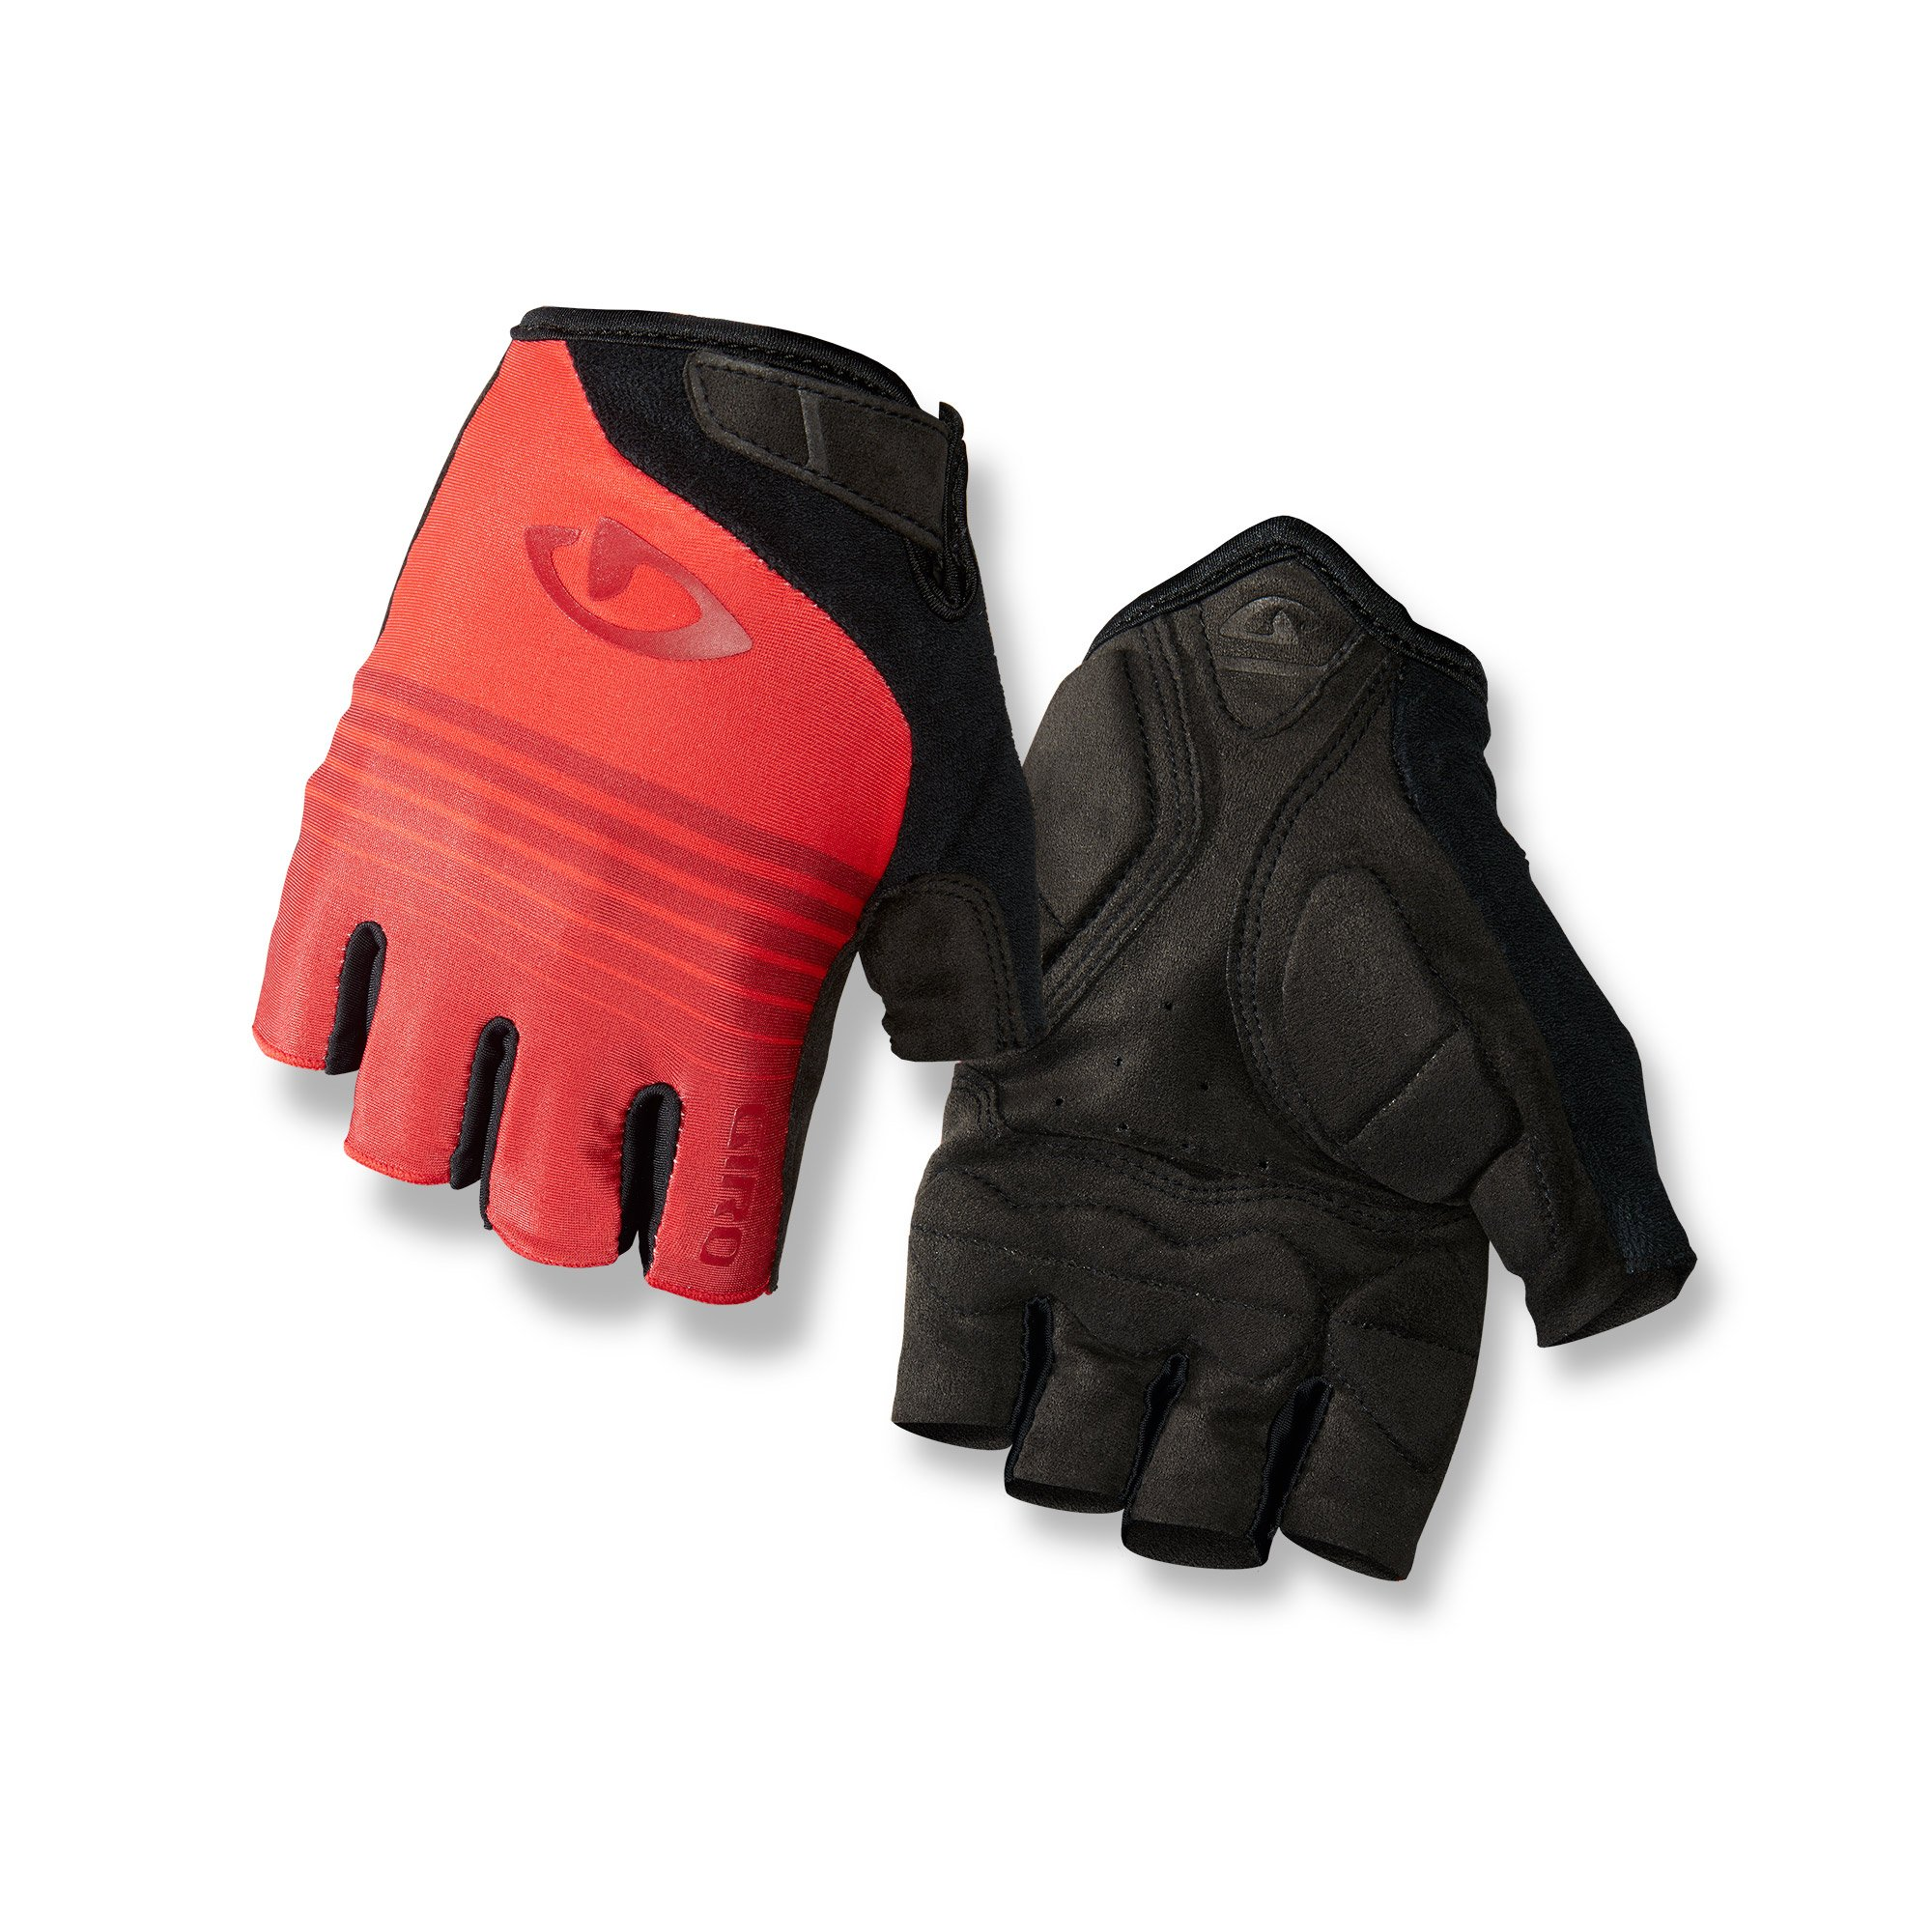 Giro Jag Road Bike Gloves Red 6 String L